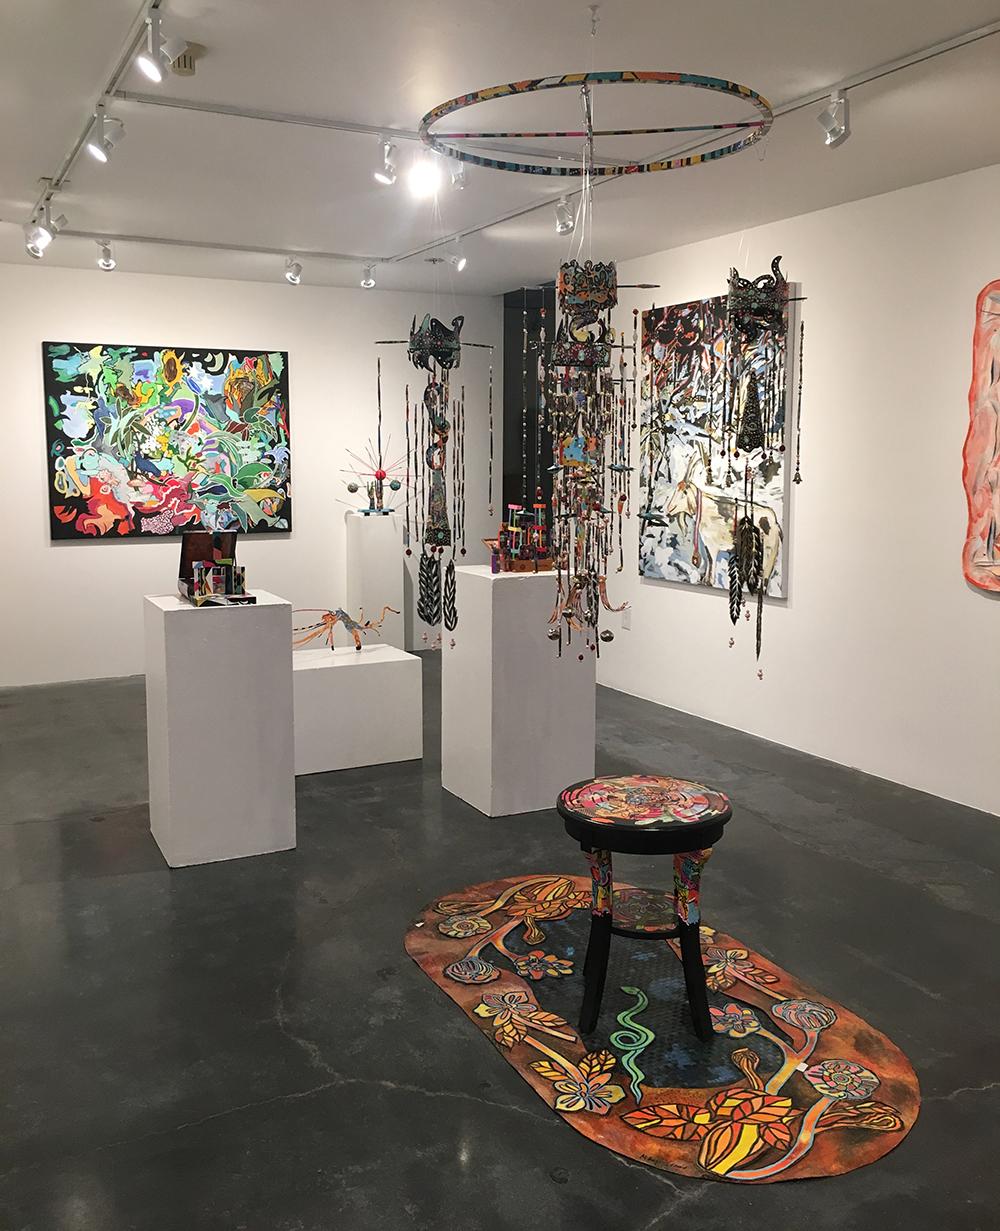 Margret Hugi-Lewis,  New Works to Stimulate the Senses , installation view, 2019